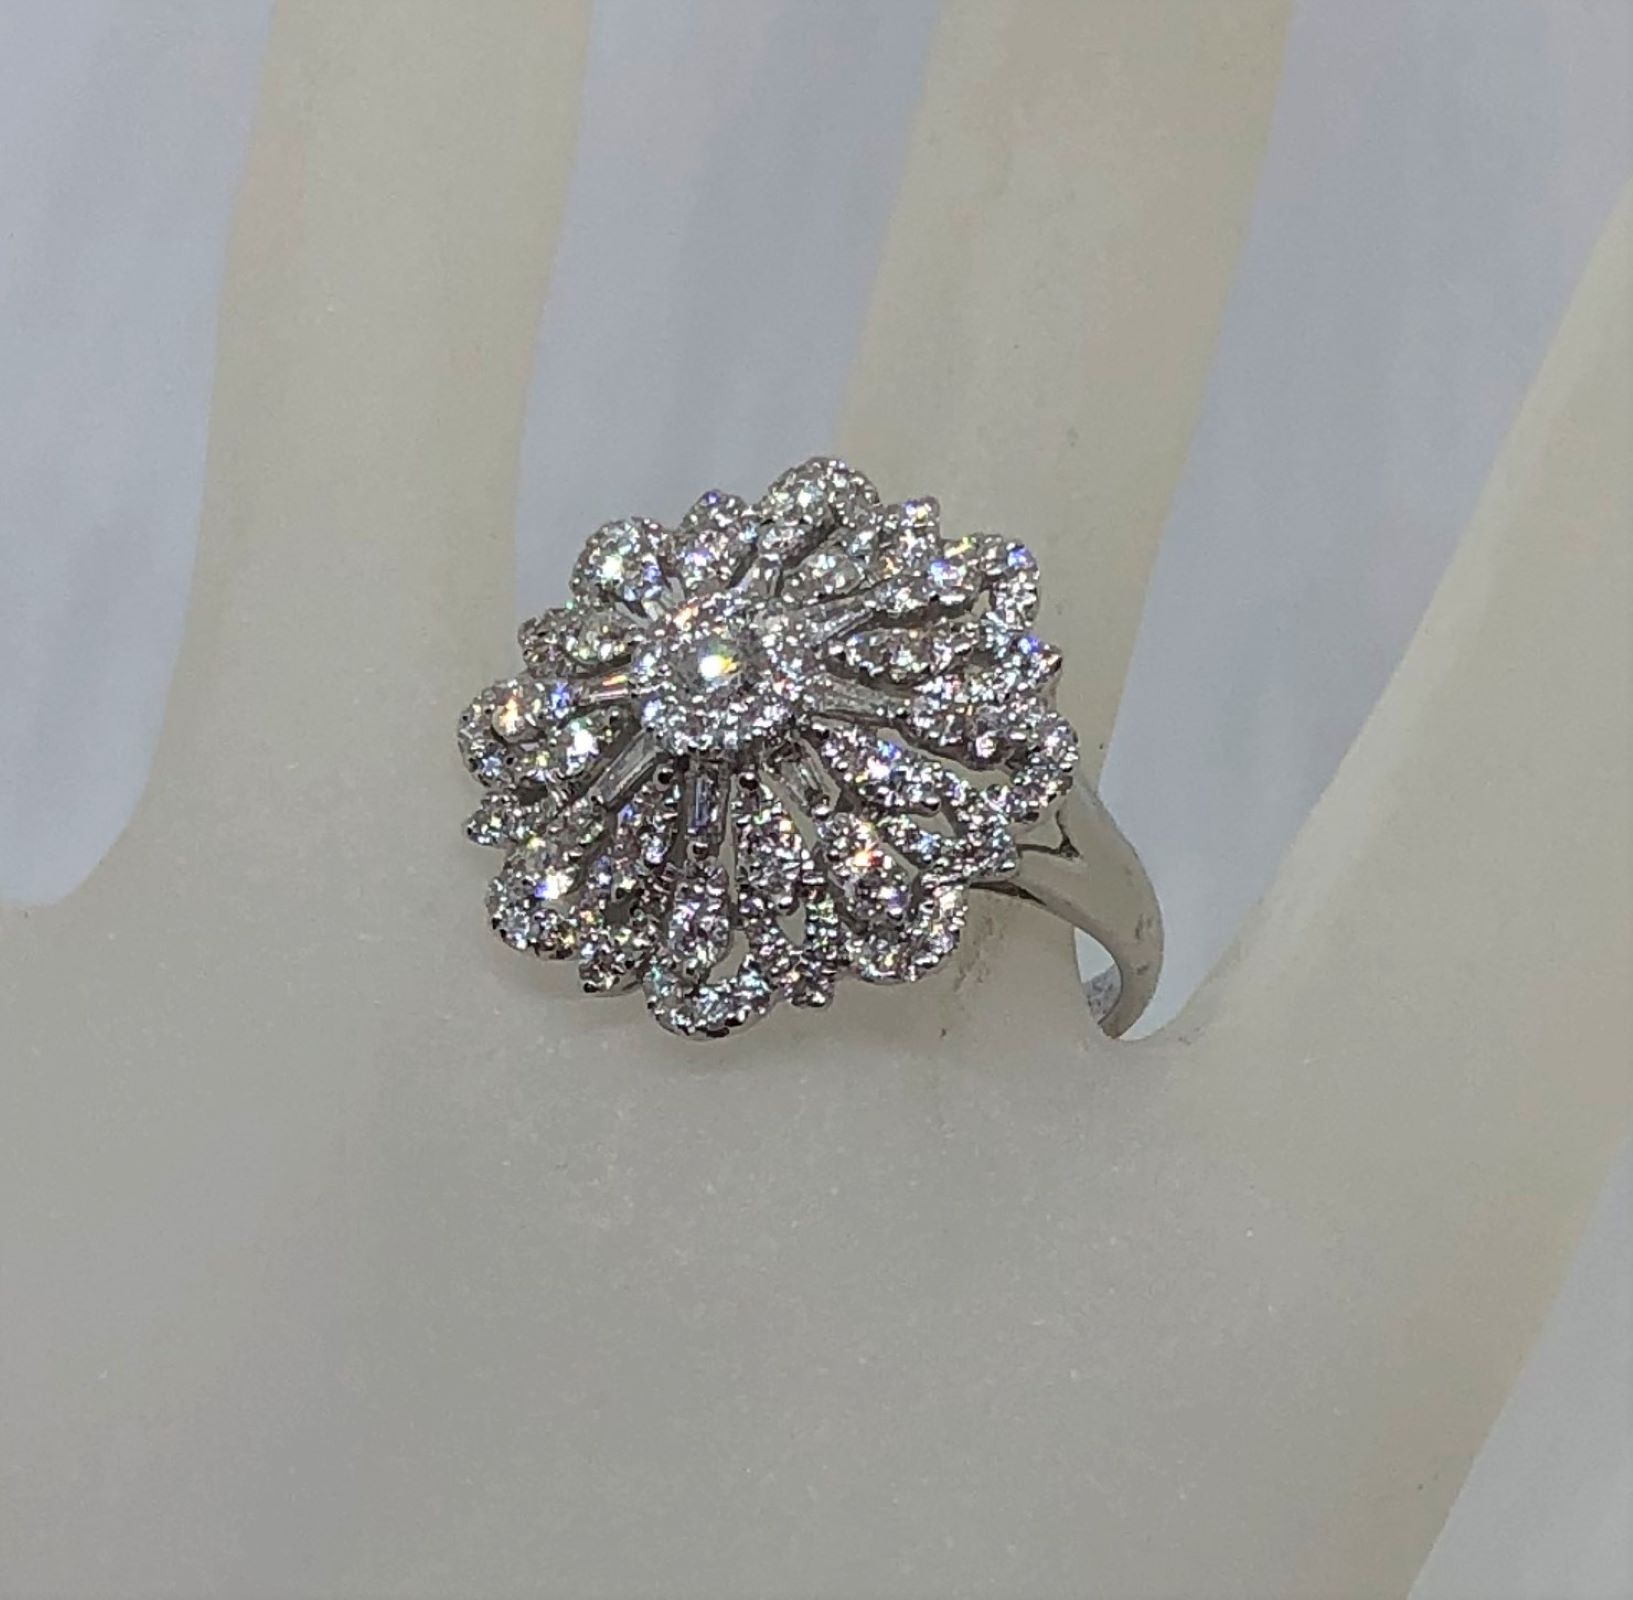 1.3 Carats Cocktail Diamond Ring